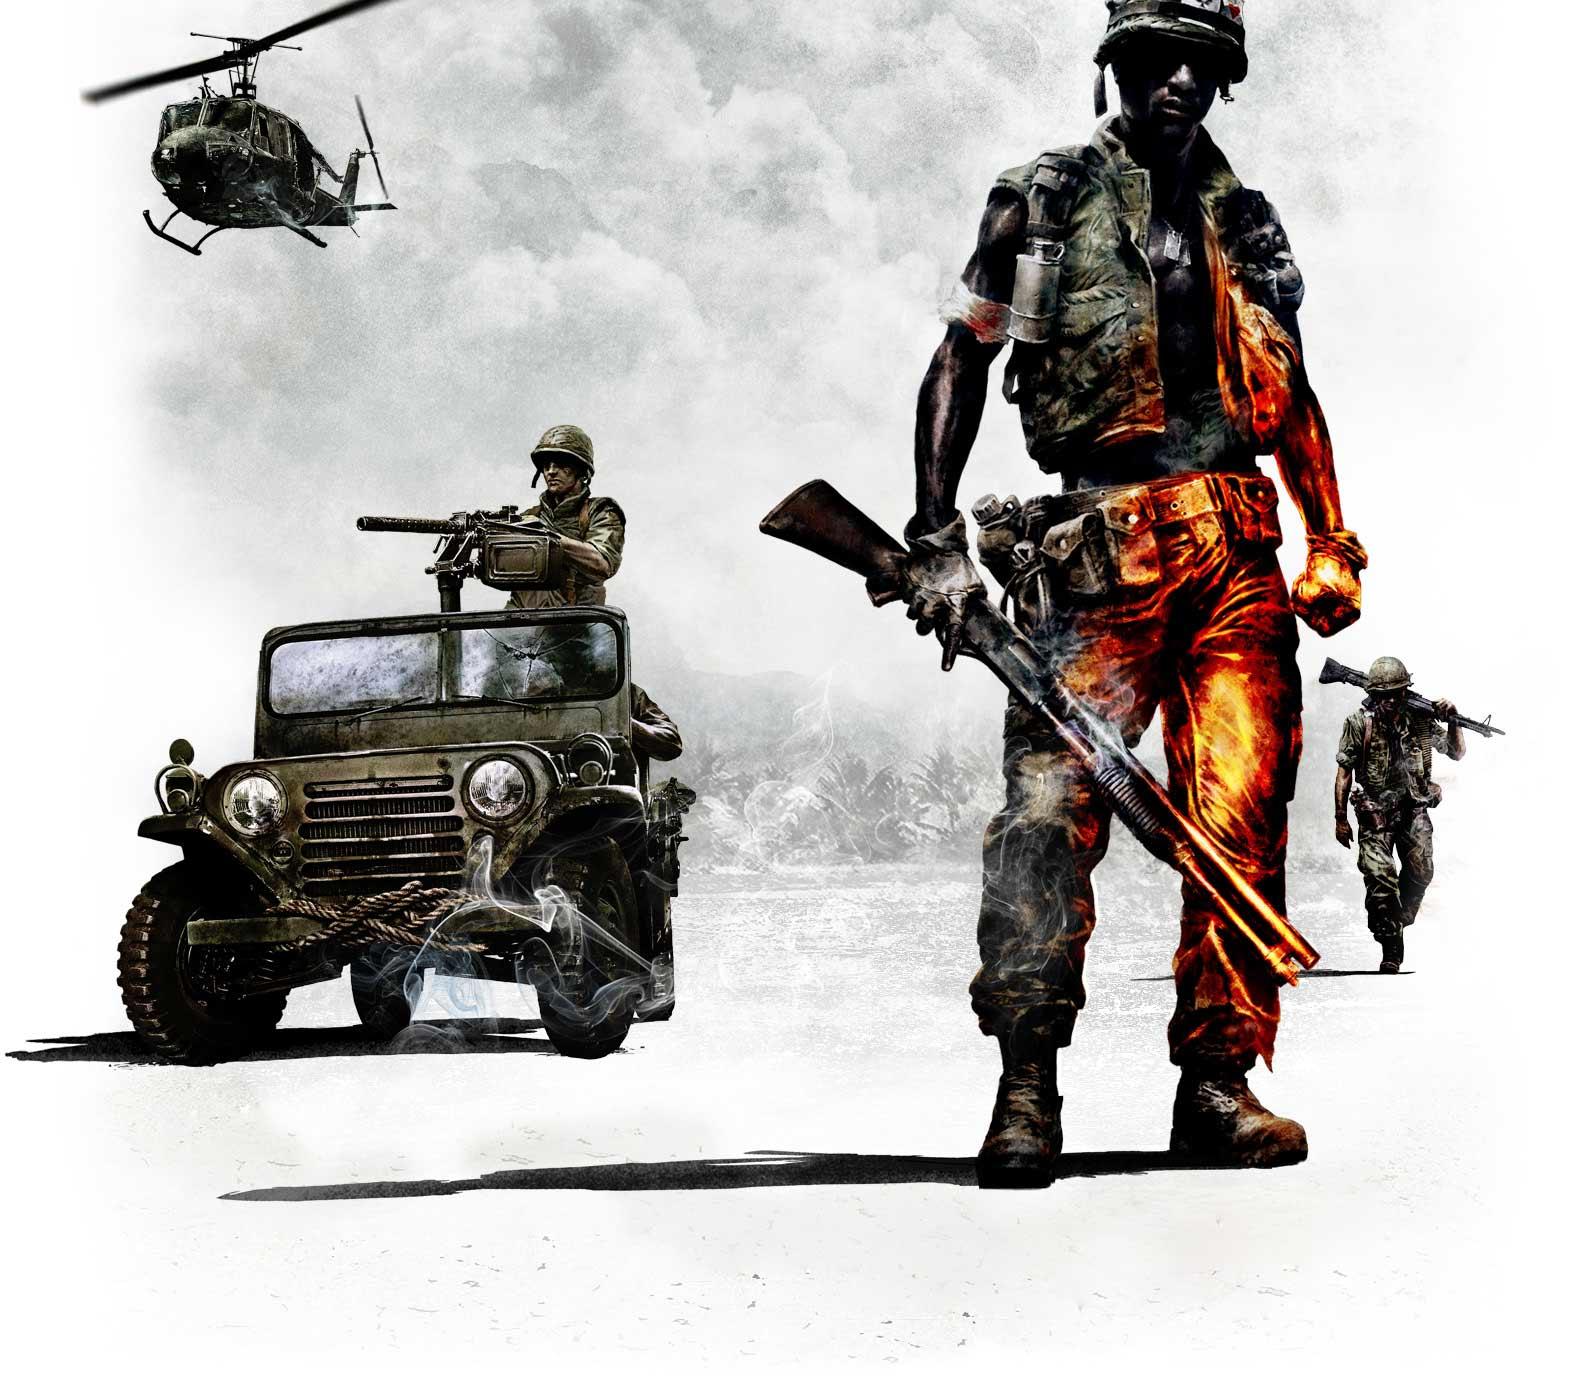 HQ Battlefield Bad Company 2 Vietnam Wallpaper   HQ Wallpapers 1580x1380